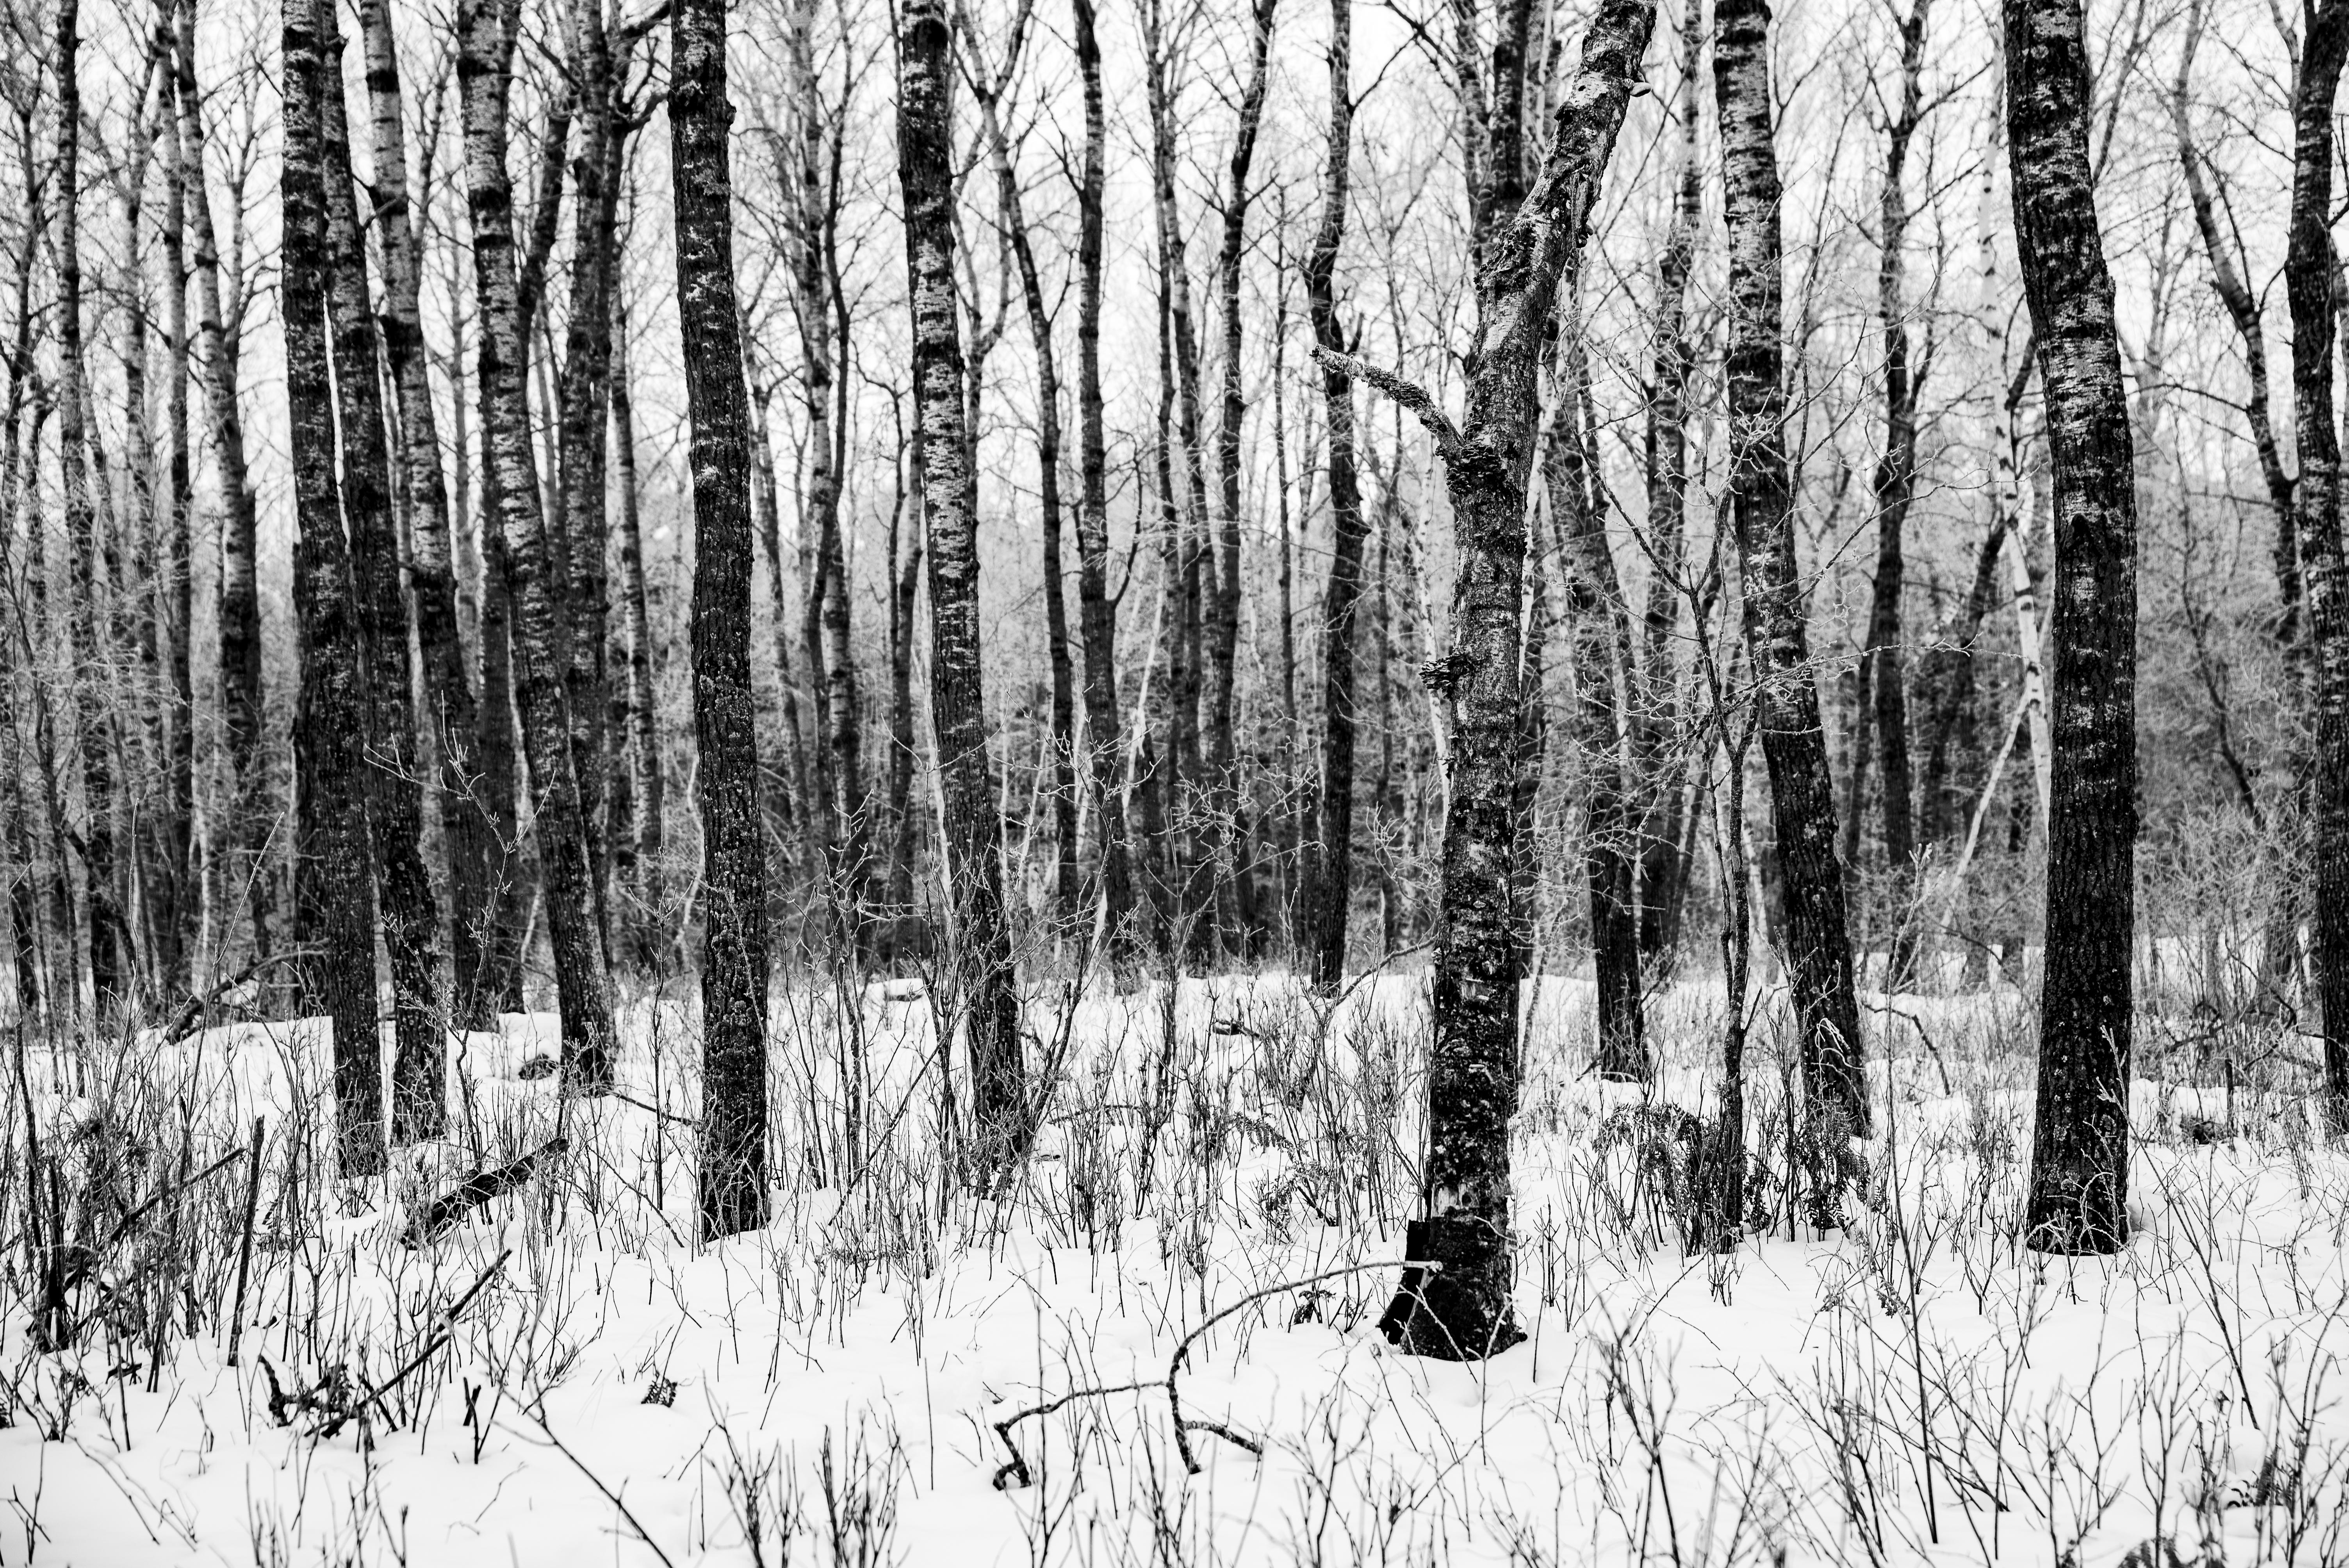 Popple Forest